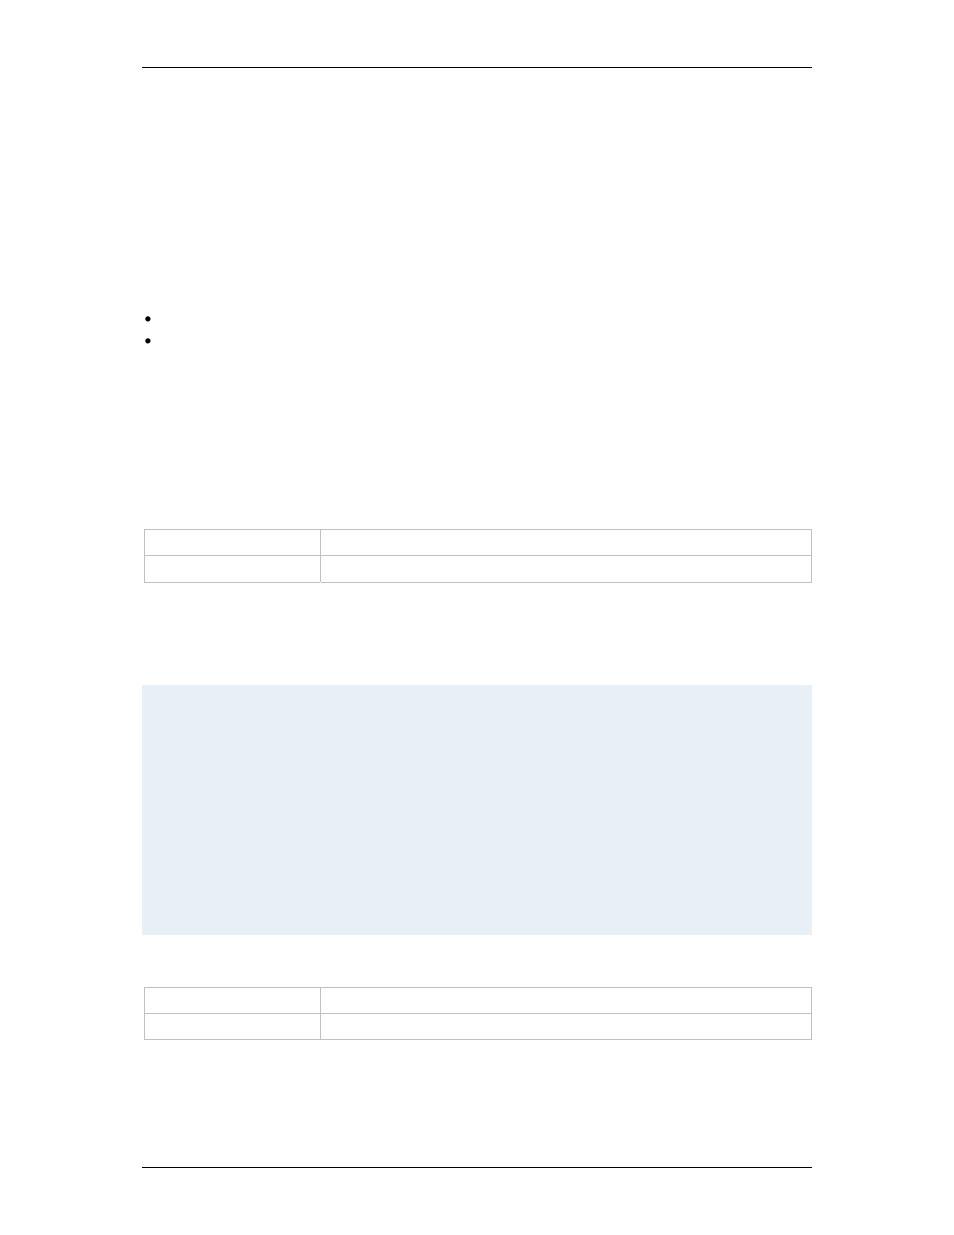 5 introduction to tandberg xml api service (txas) | TANDBERG